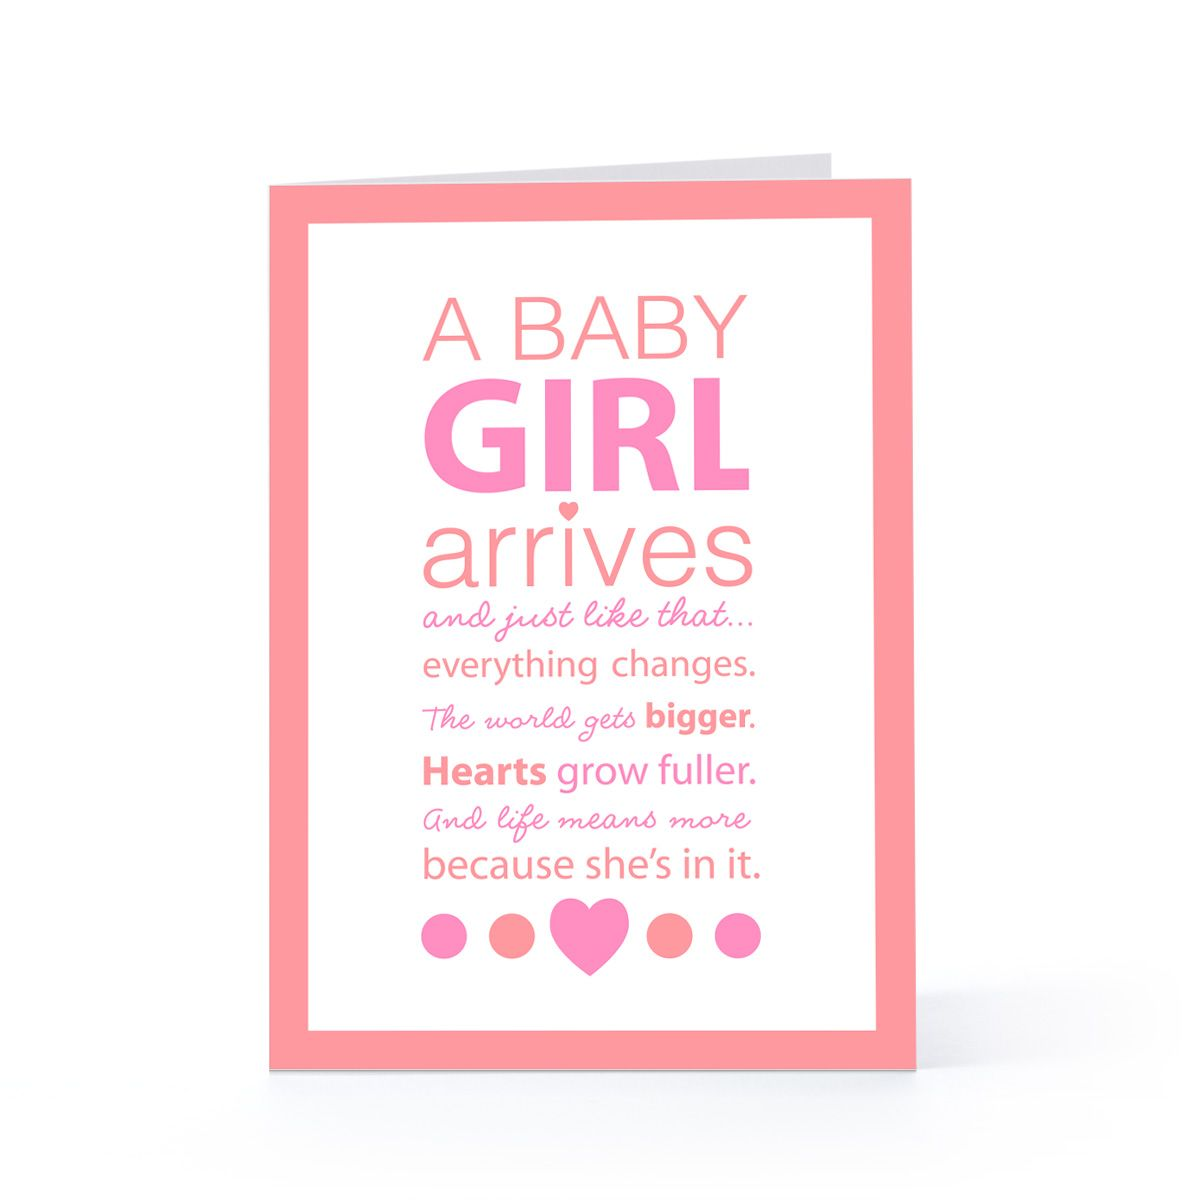 New Baby Girl Quotes new baby girl quotes   Google Search | Baby girl | Baby, Baby  New Baby Girl Quotes